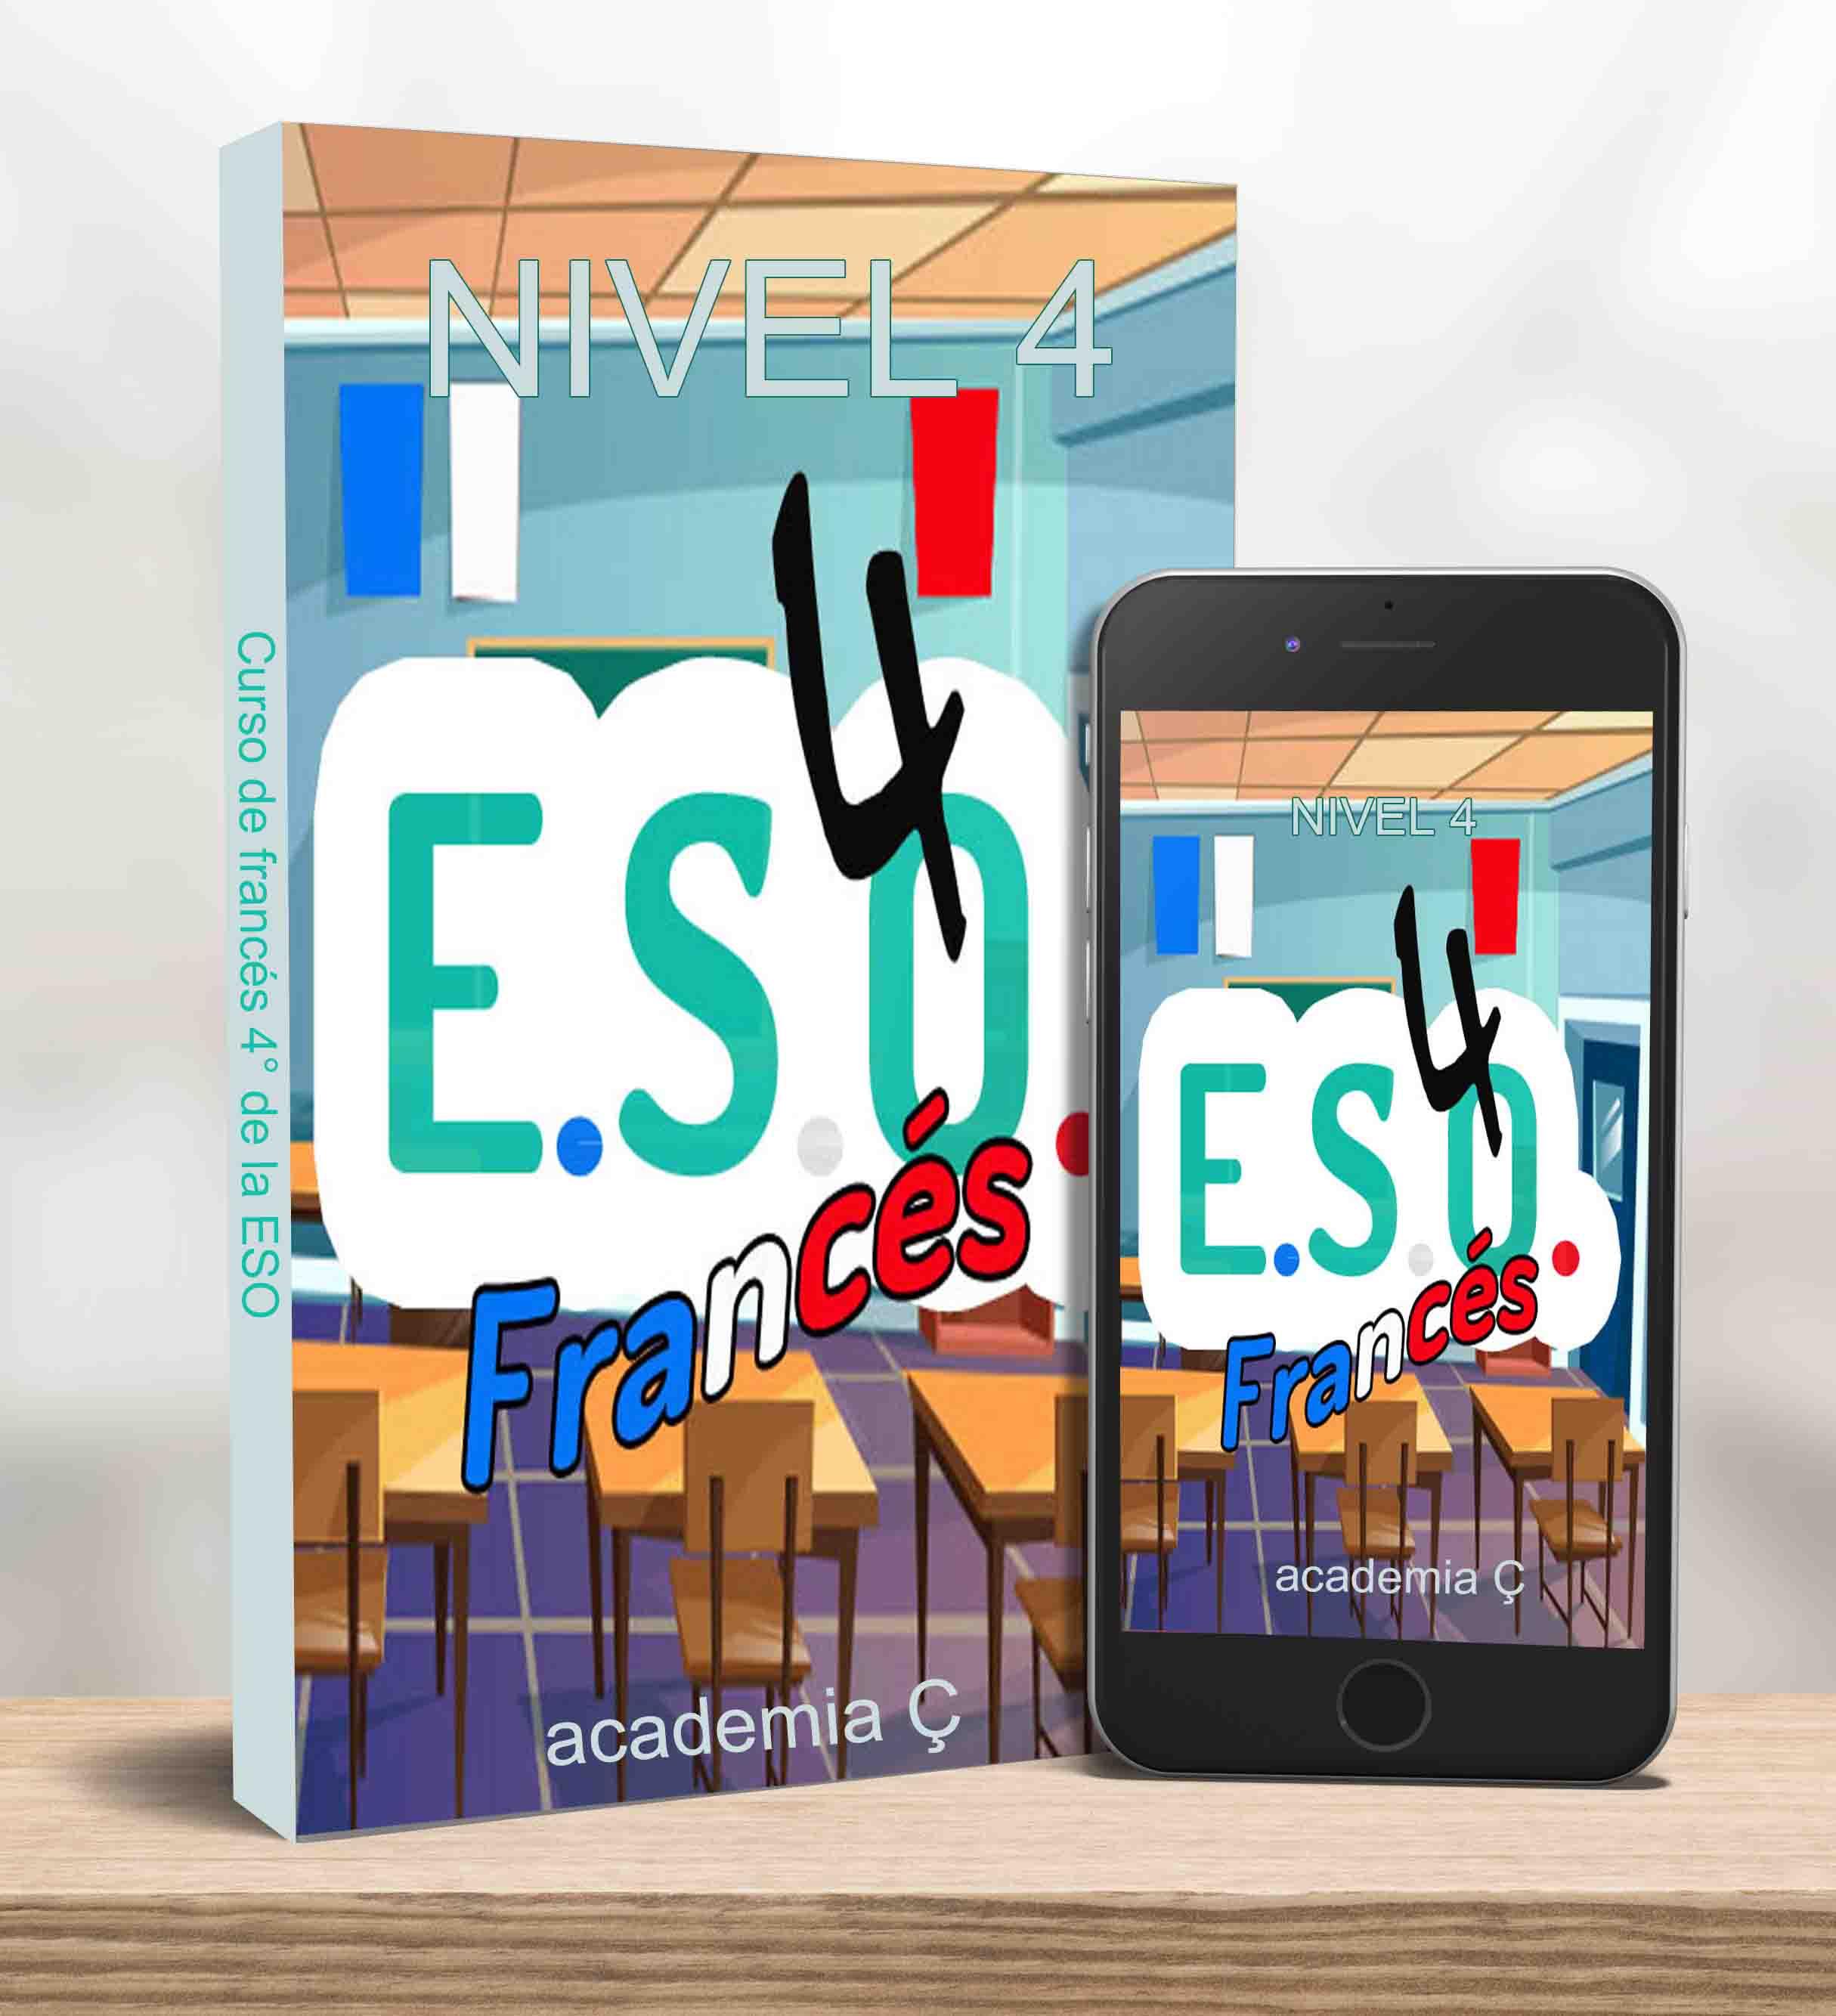 curso-de-frances-NIVEL-4-ESO-academia-cedilla-1